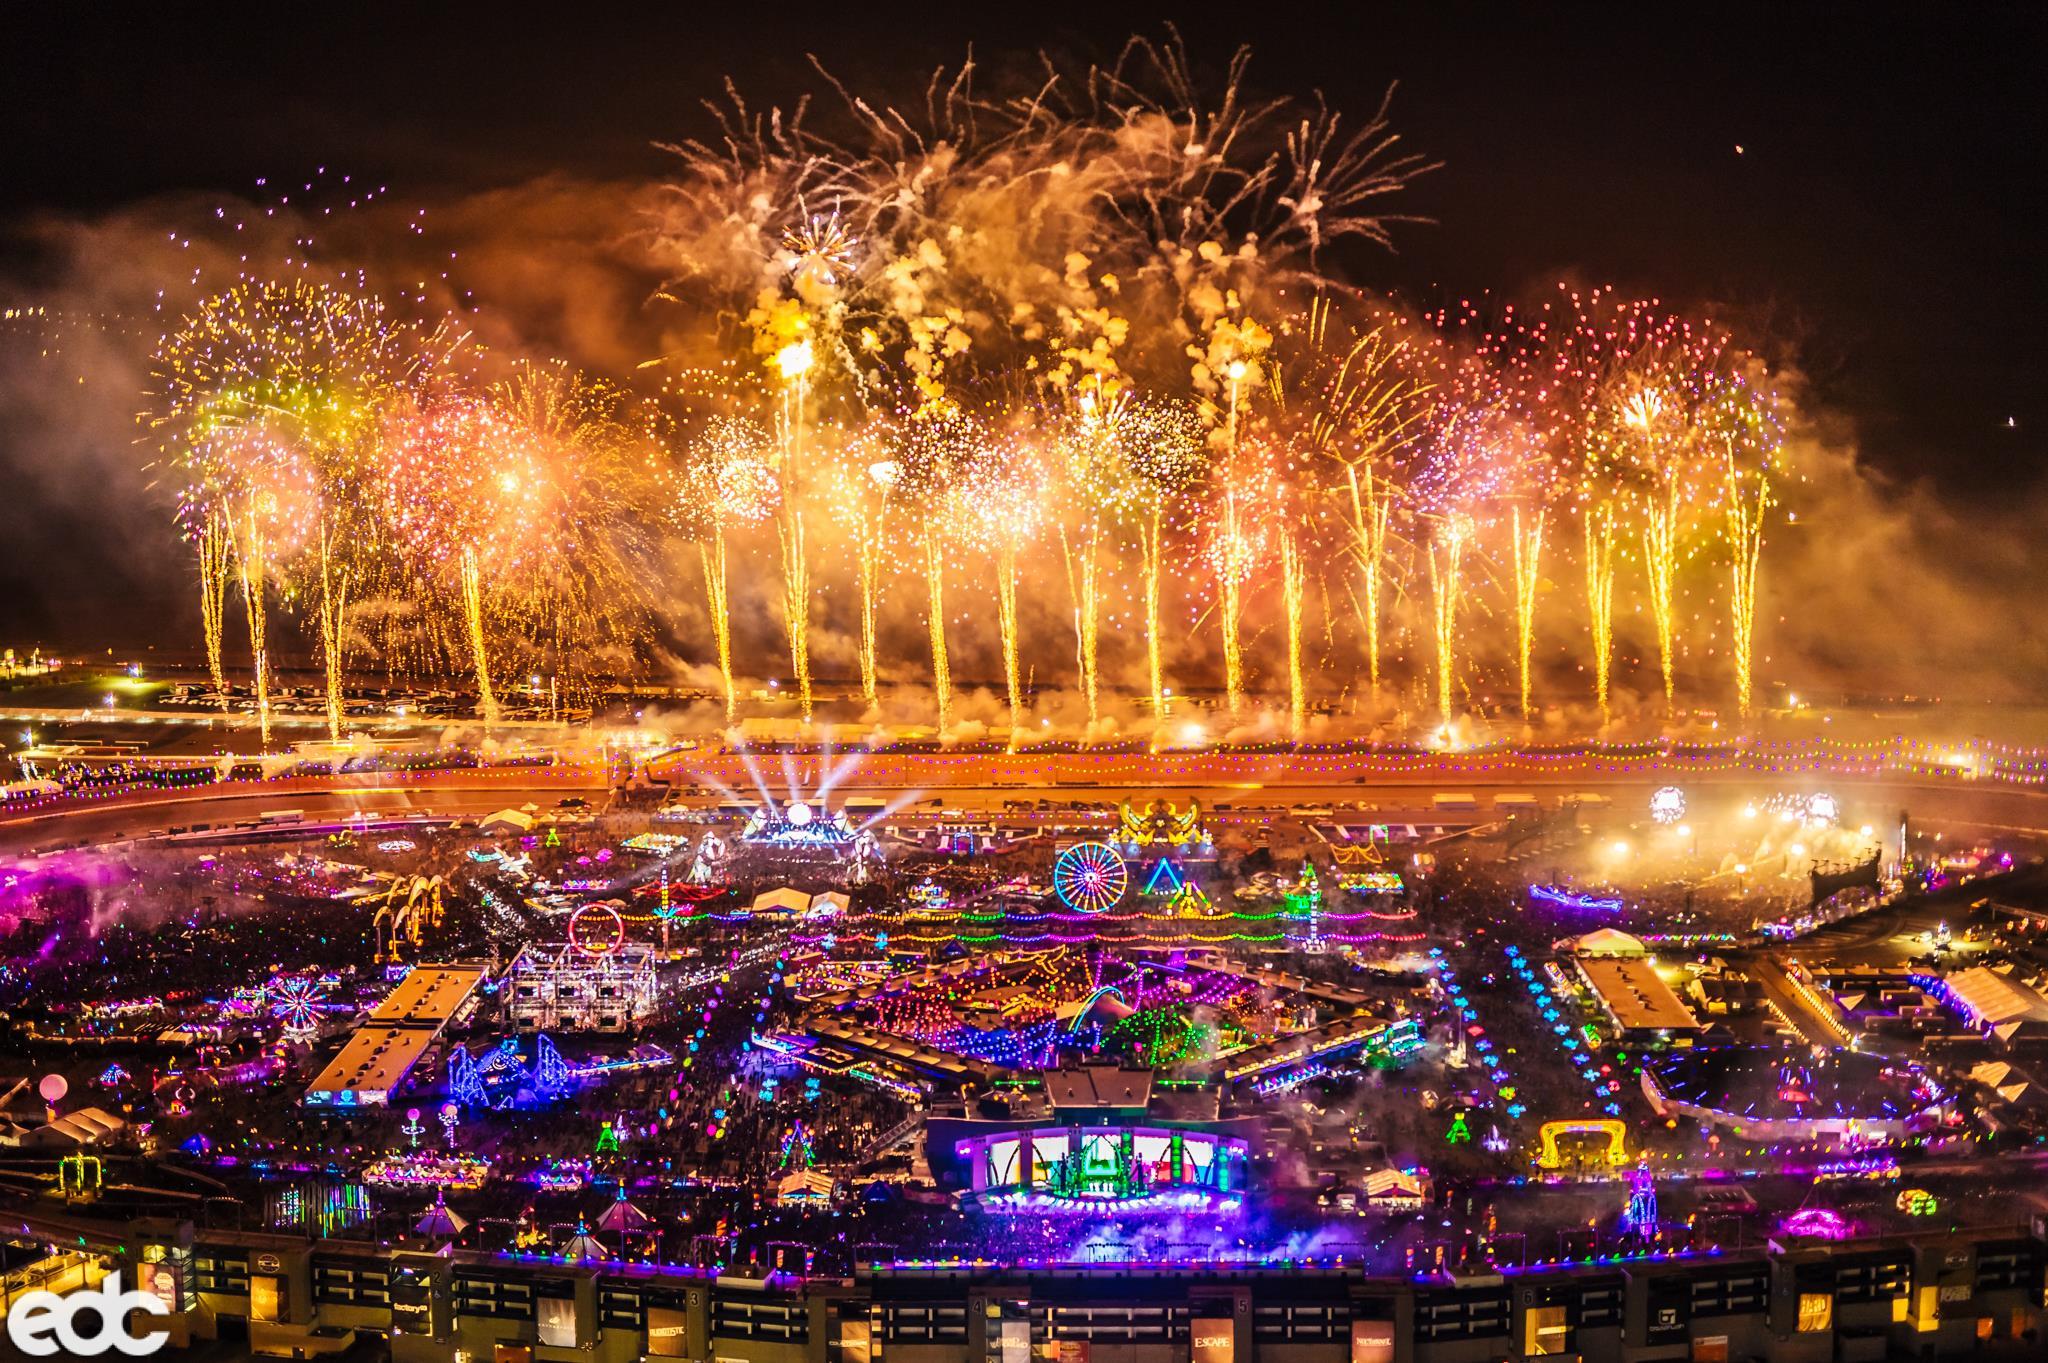 5 Things We Loved About EDC Las Vegas 2018